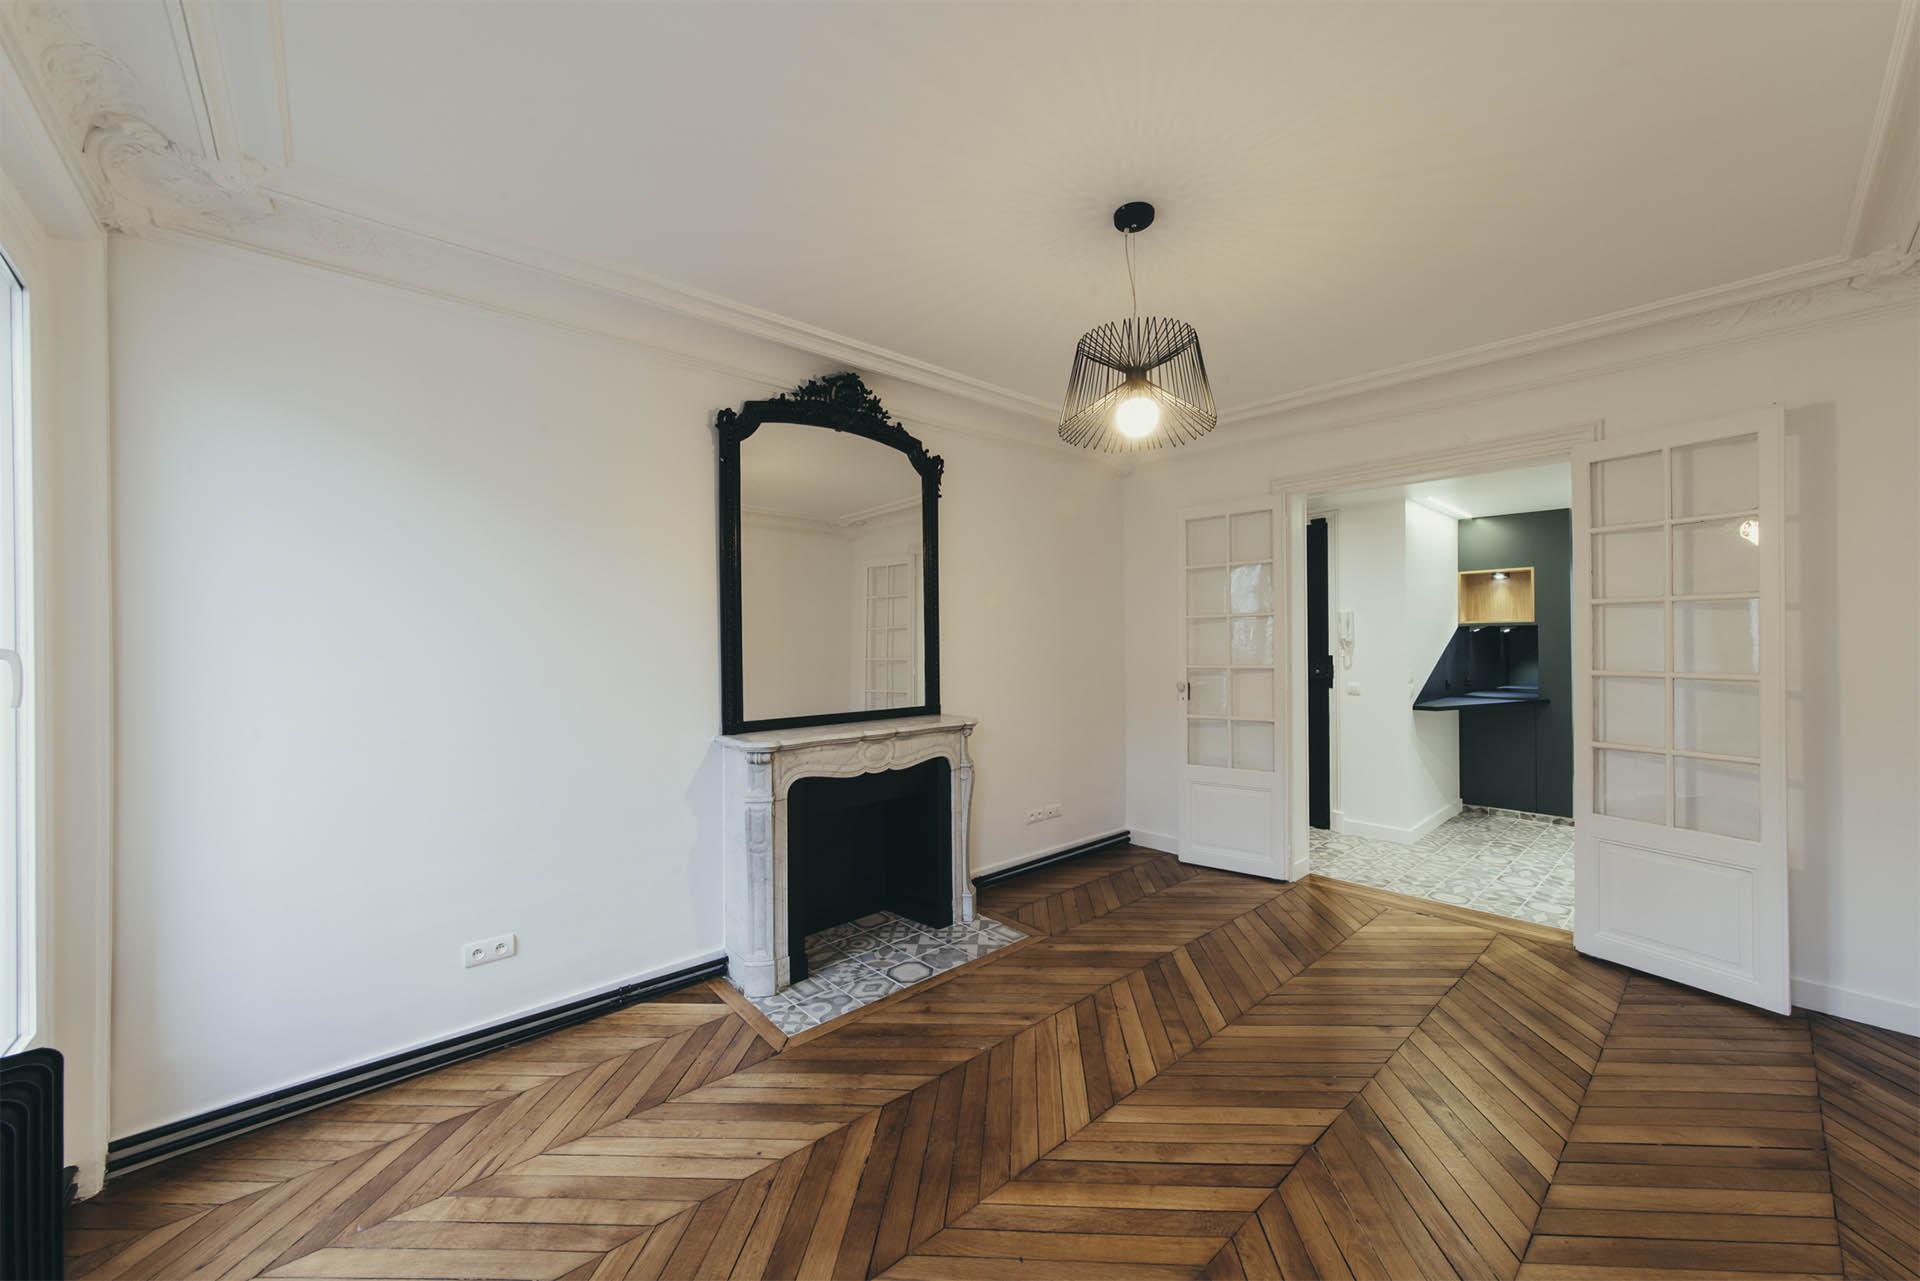 Valentin-Paris-Architecte-Avenue-des-Gobelins-Dec-2016-©-Genaro-Bardy-1-1920